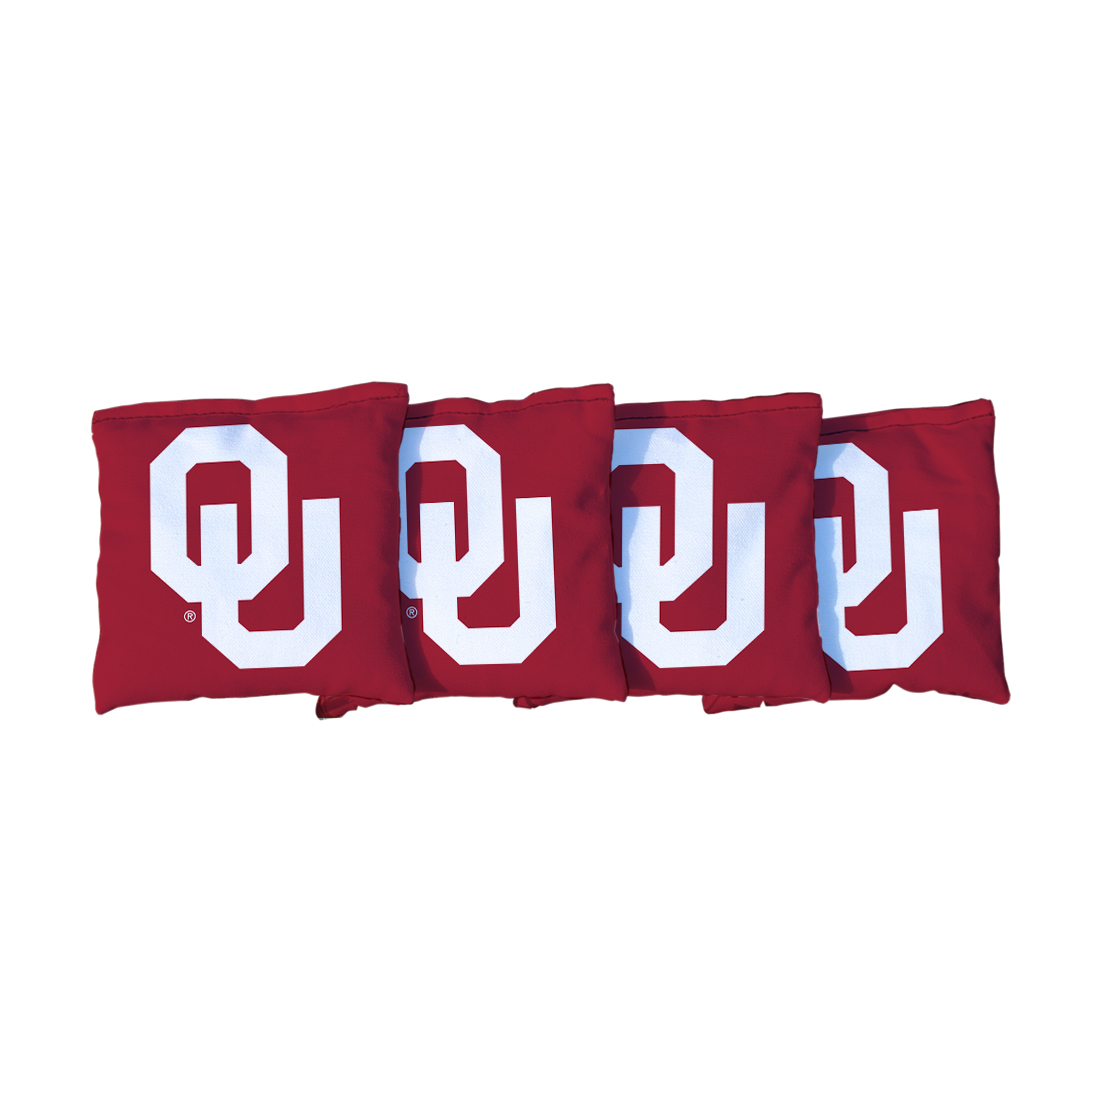 4 Oklahoma Sooner Crimson Cornhole Bags